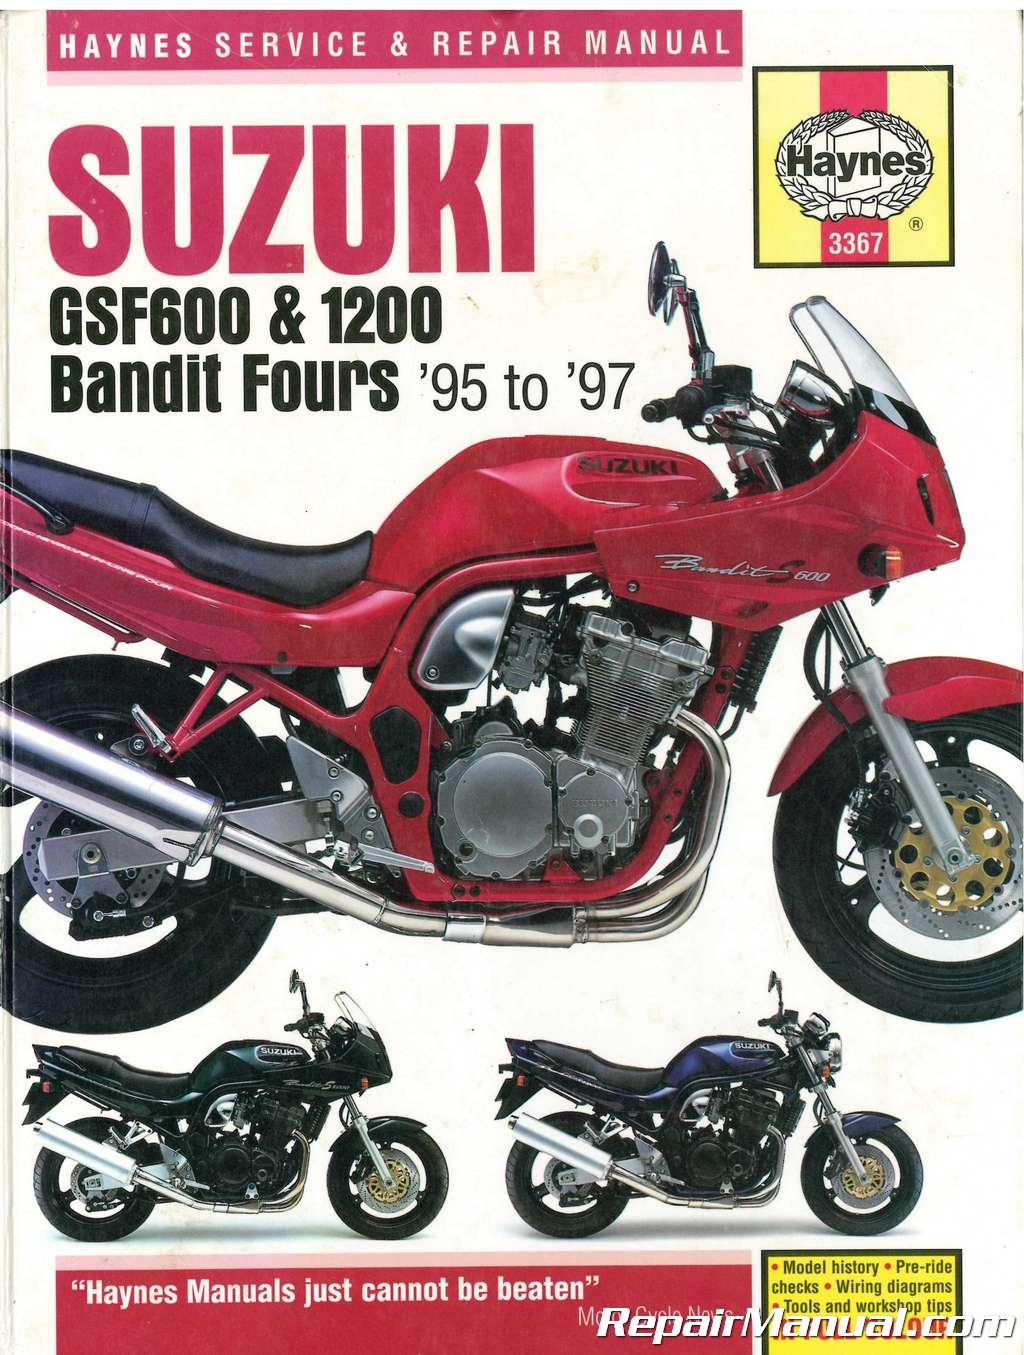 Used Haynes Suzuki Gsf600 Gsf1200 Bandit 1995